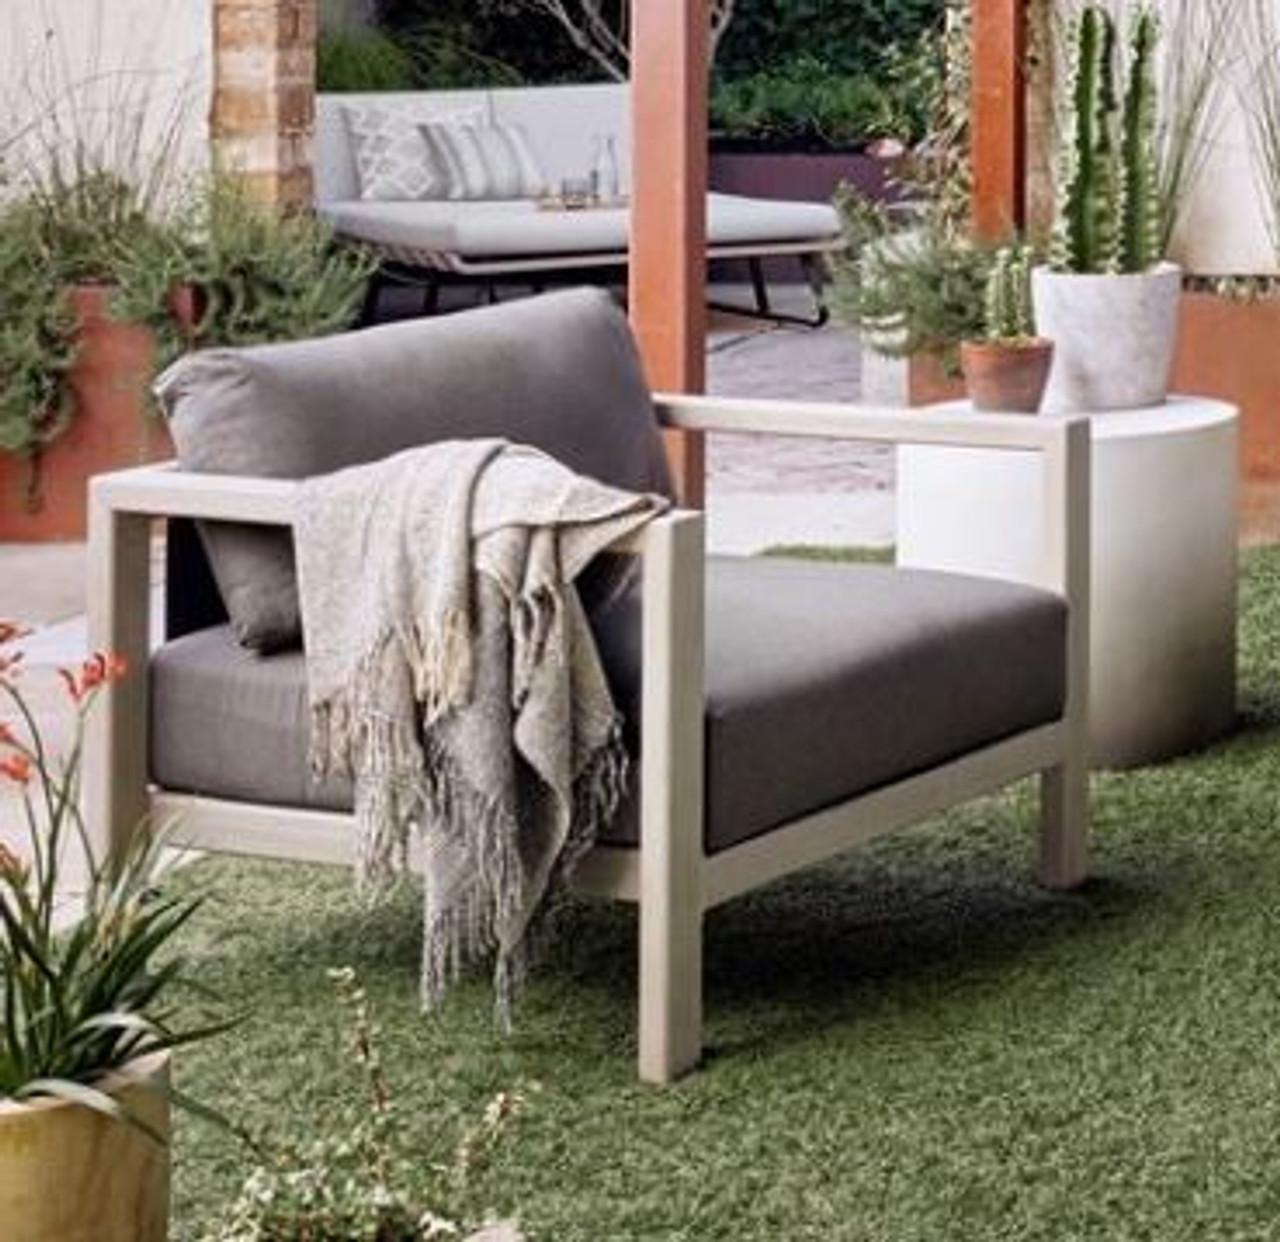 Oceanside Outdoor Teak Lounge Chair - Weathered Grey